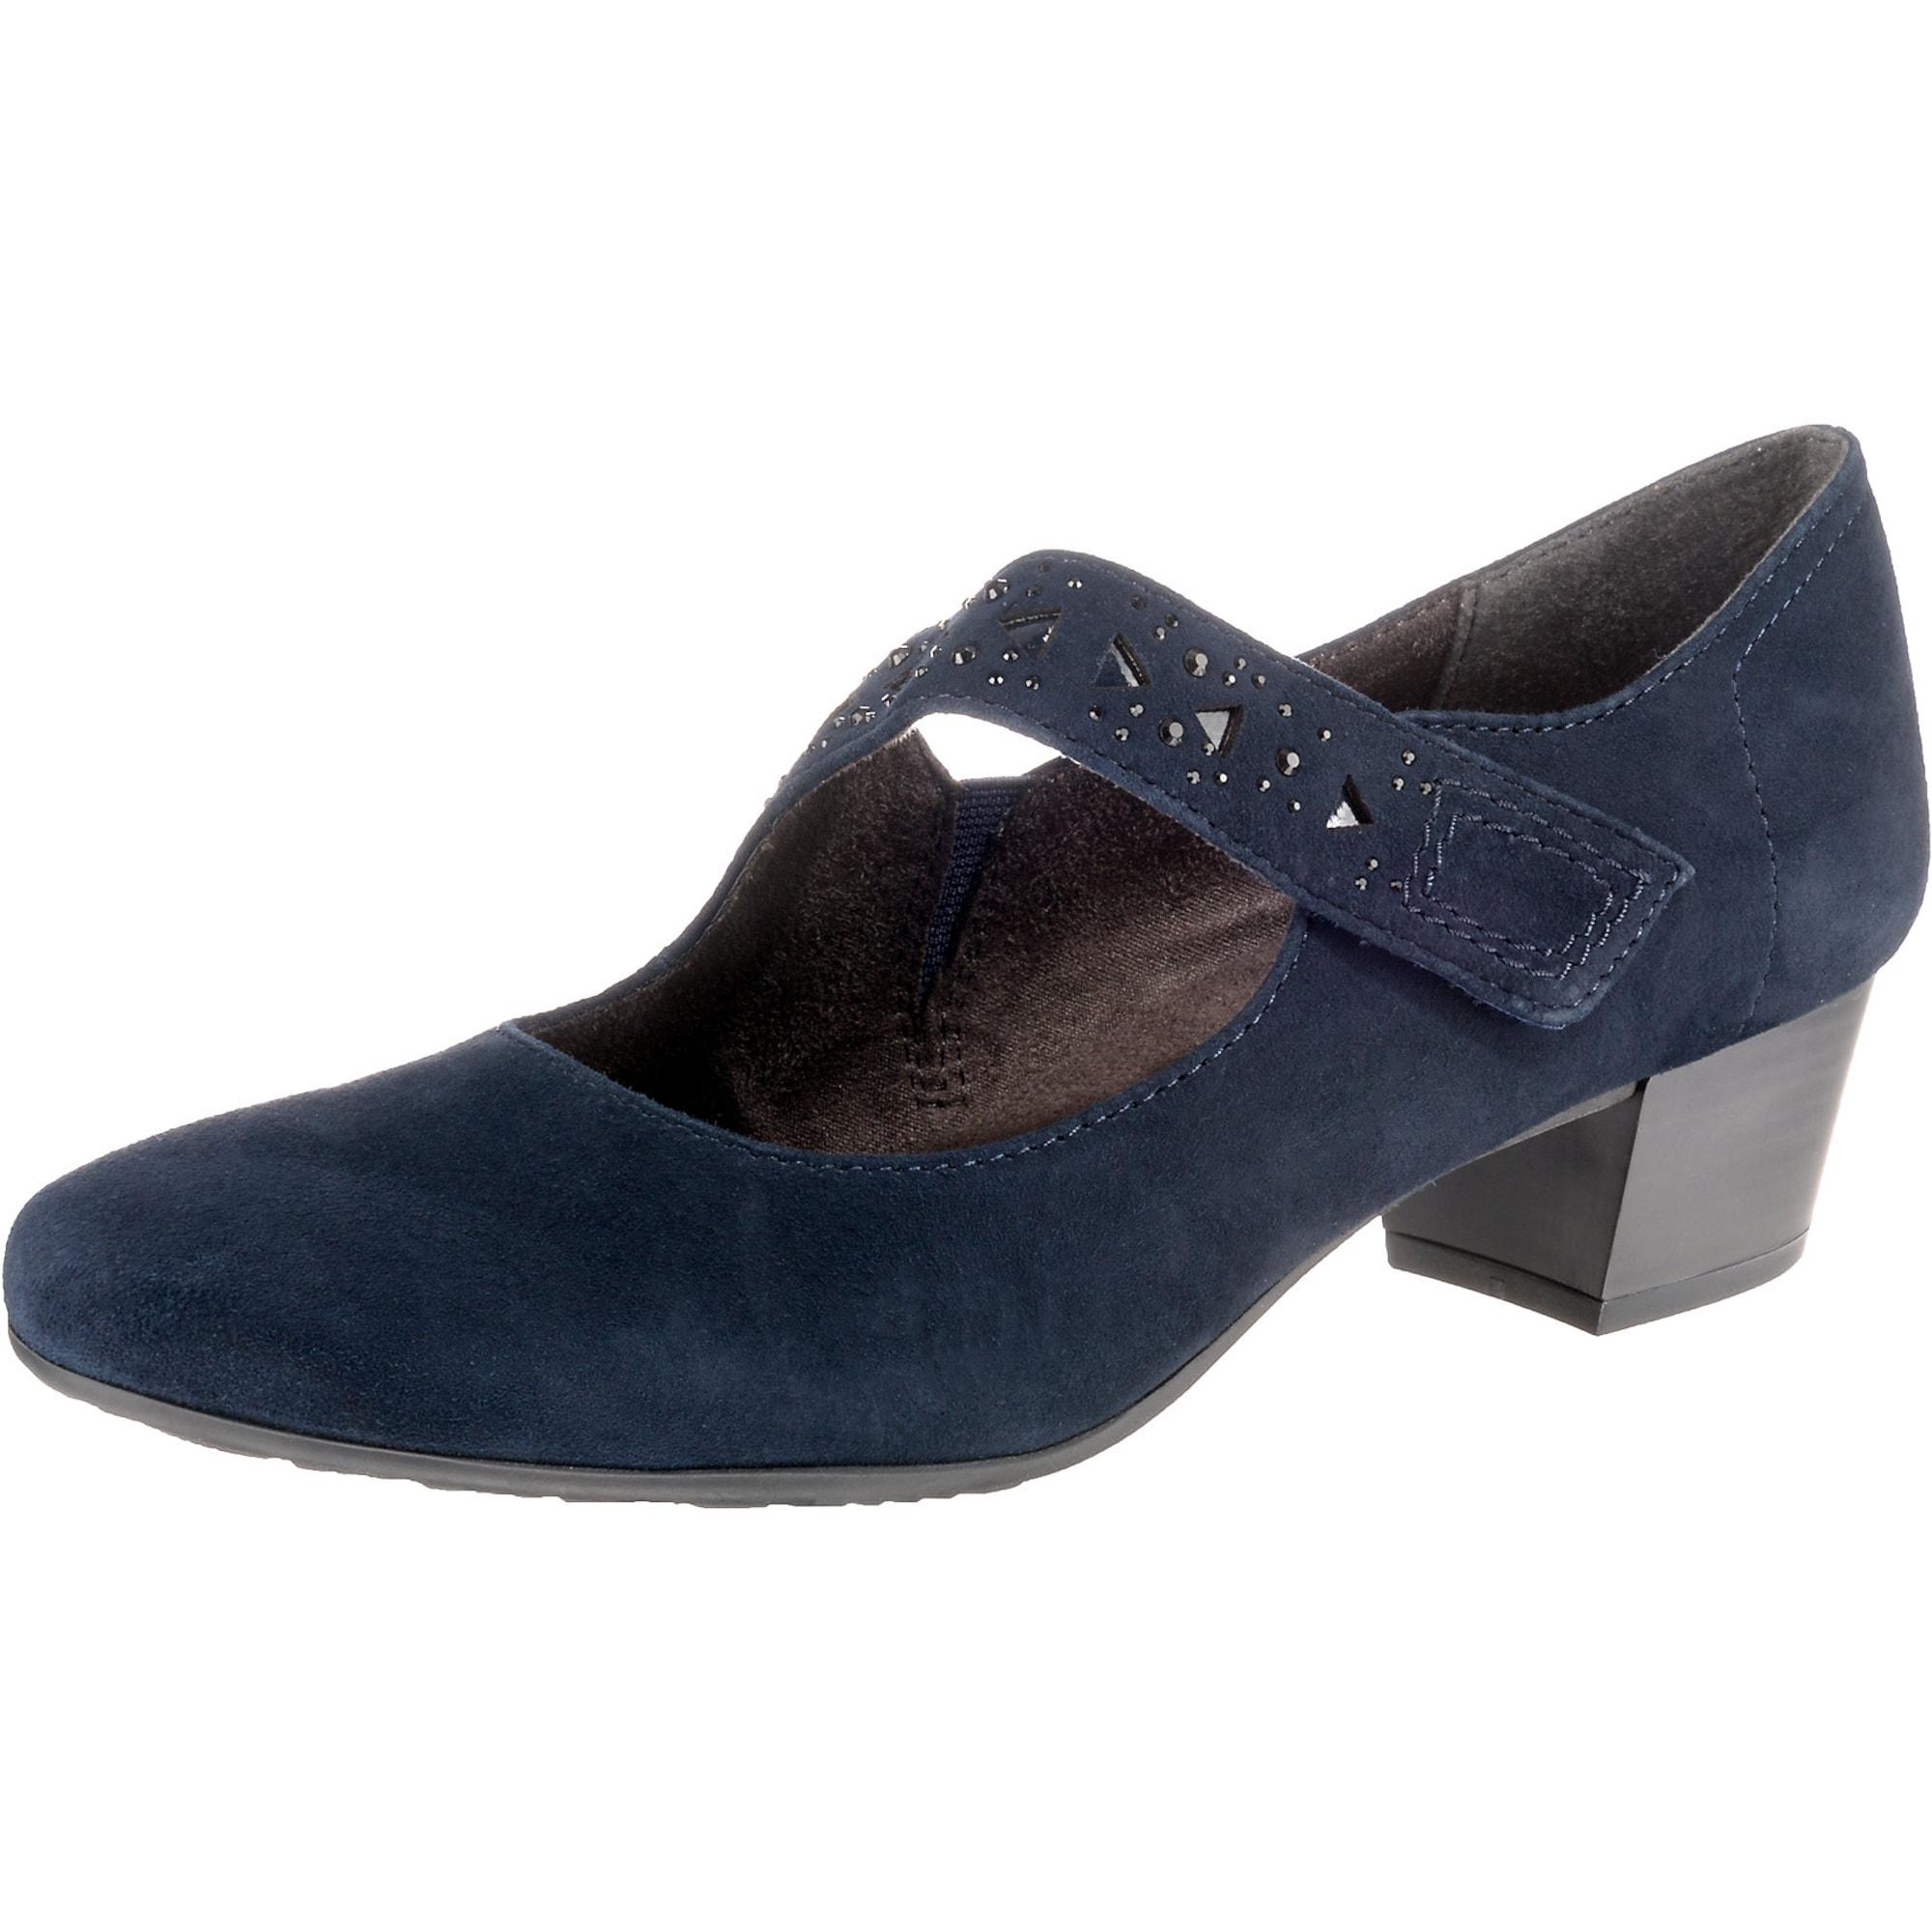 Spangenpumps | Schuhe > Pumps > Spangenpumps | Blau | JANA